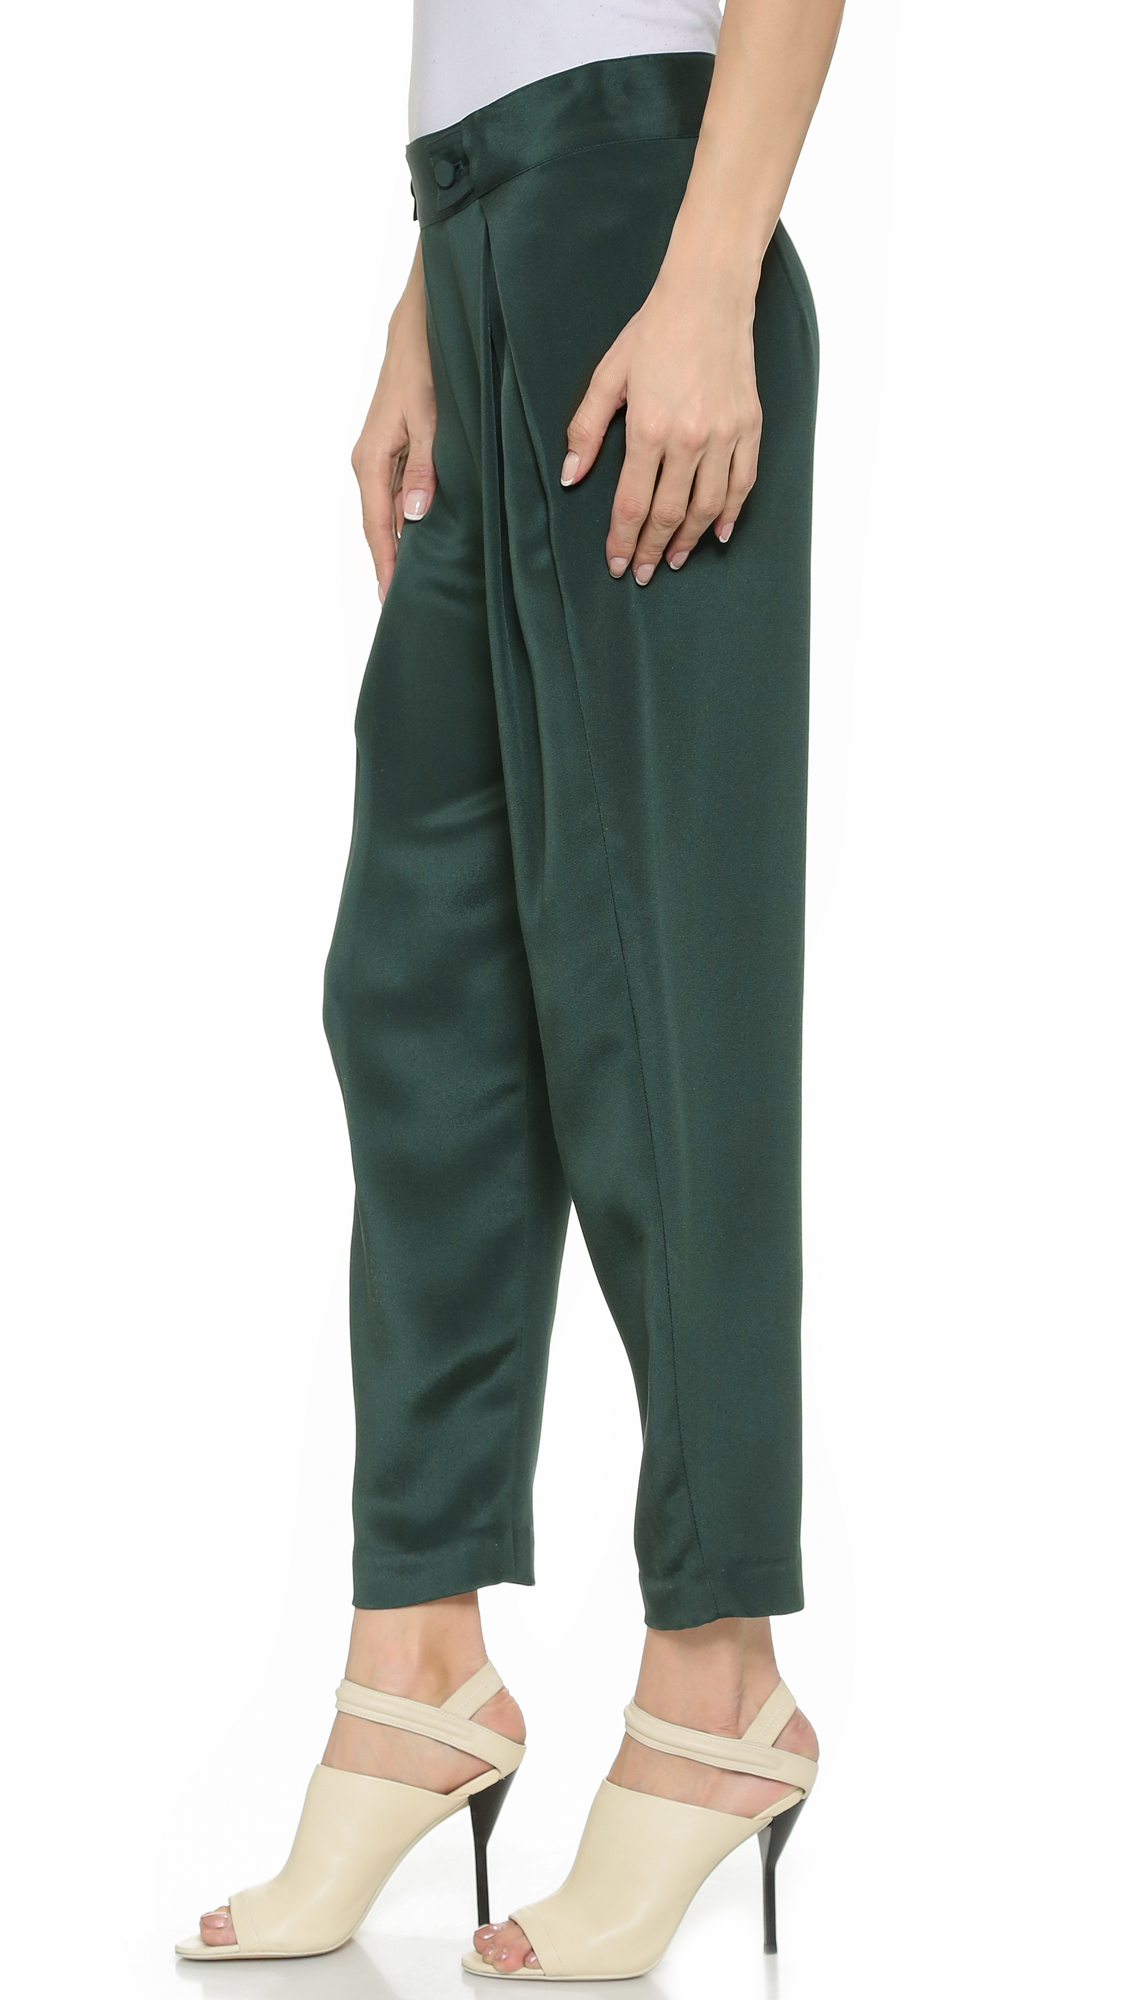 Lyst - 3.1 Phillip Lim Silk Waist Tab Pants - Greenleaf in Green